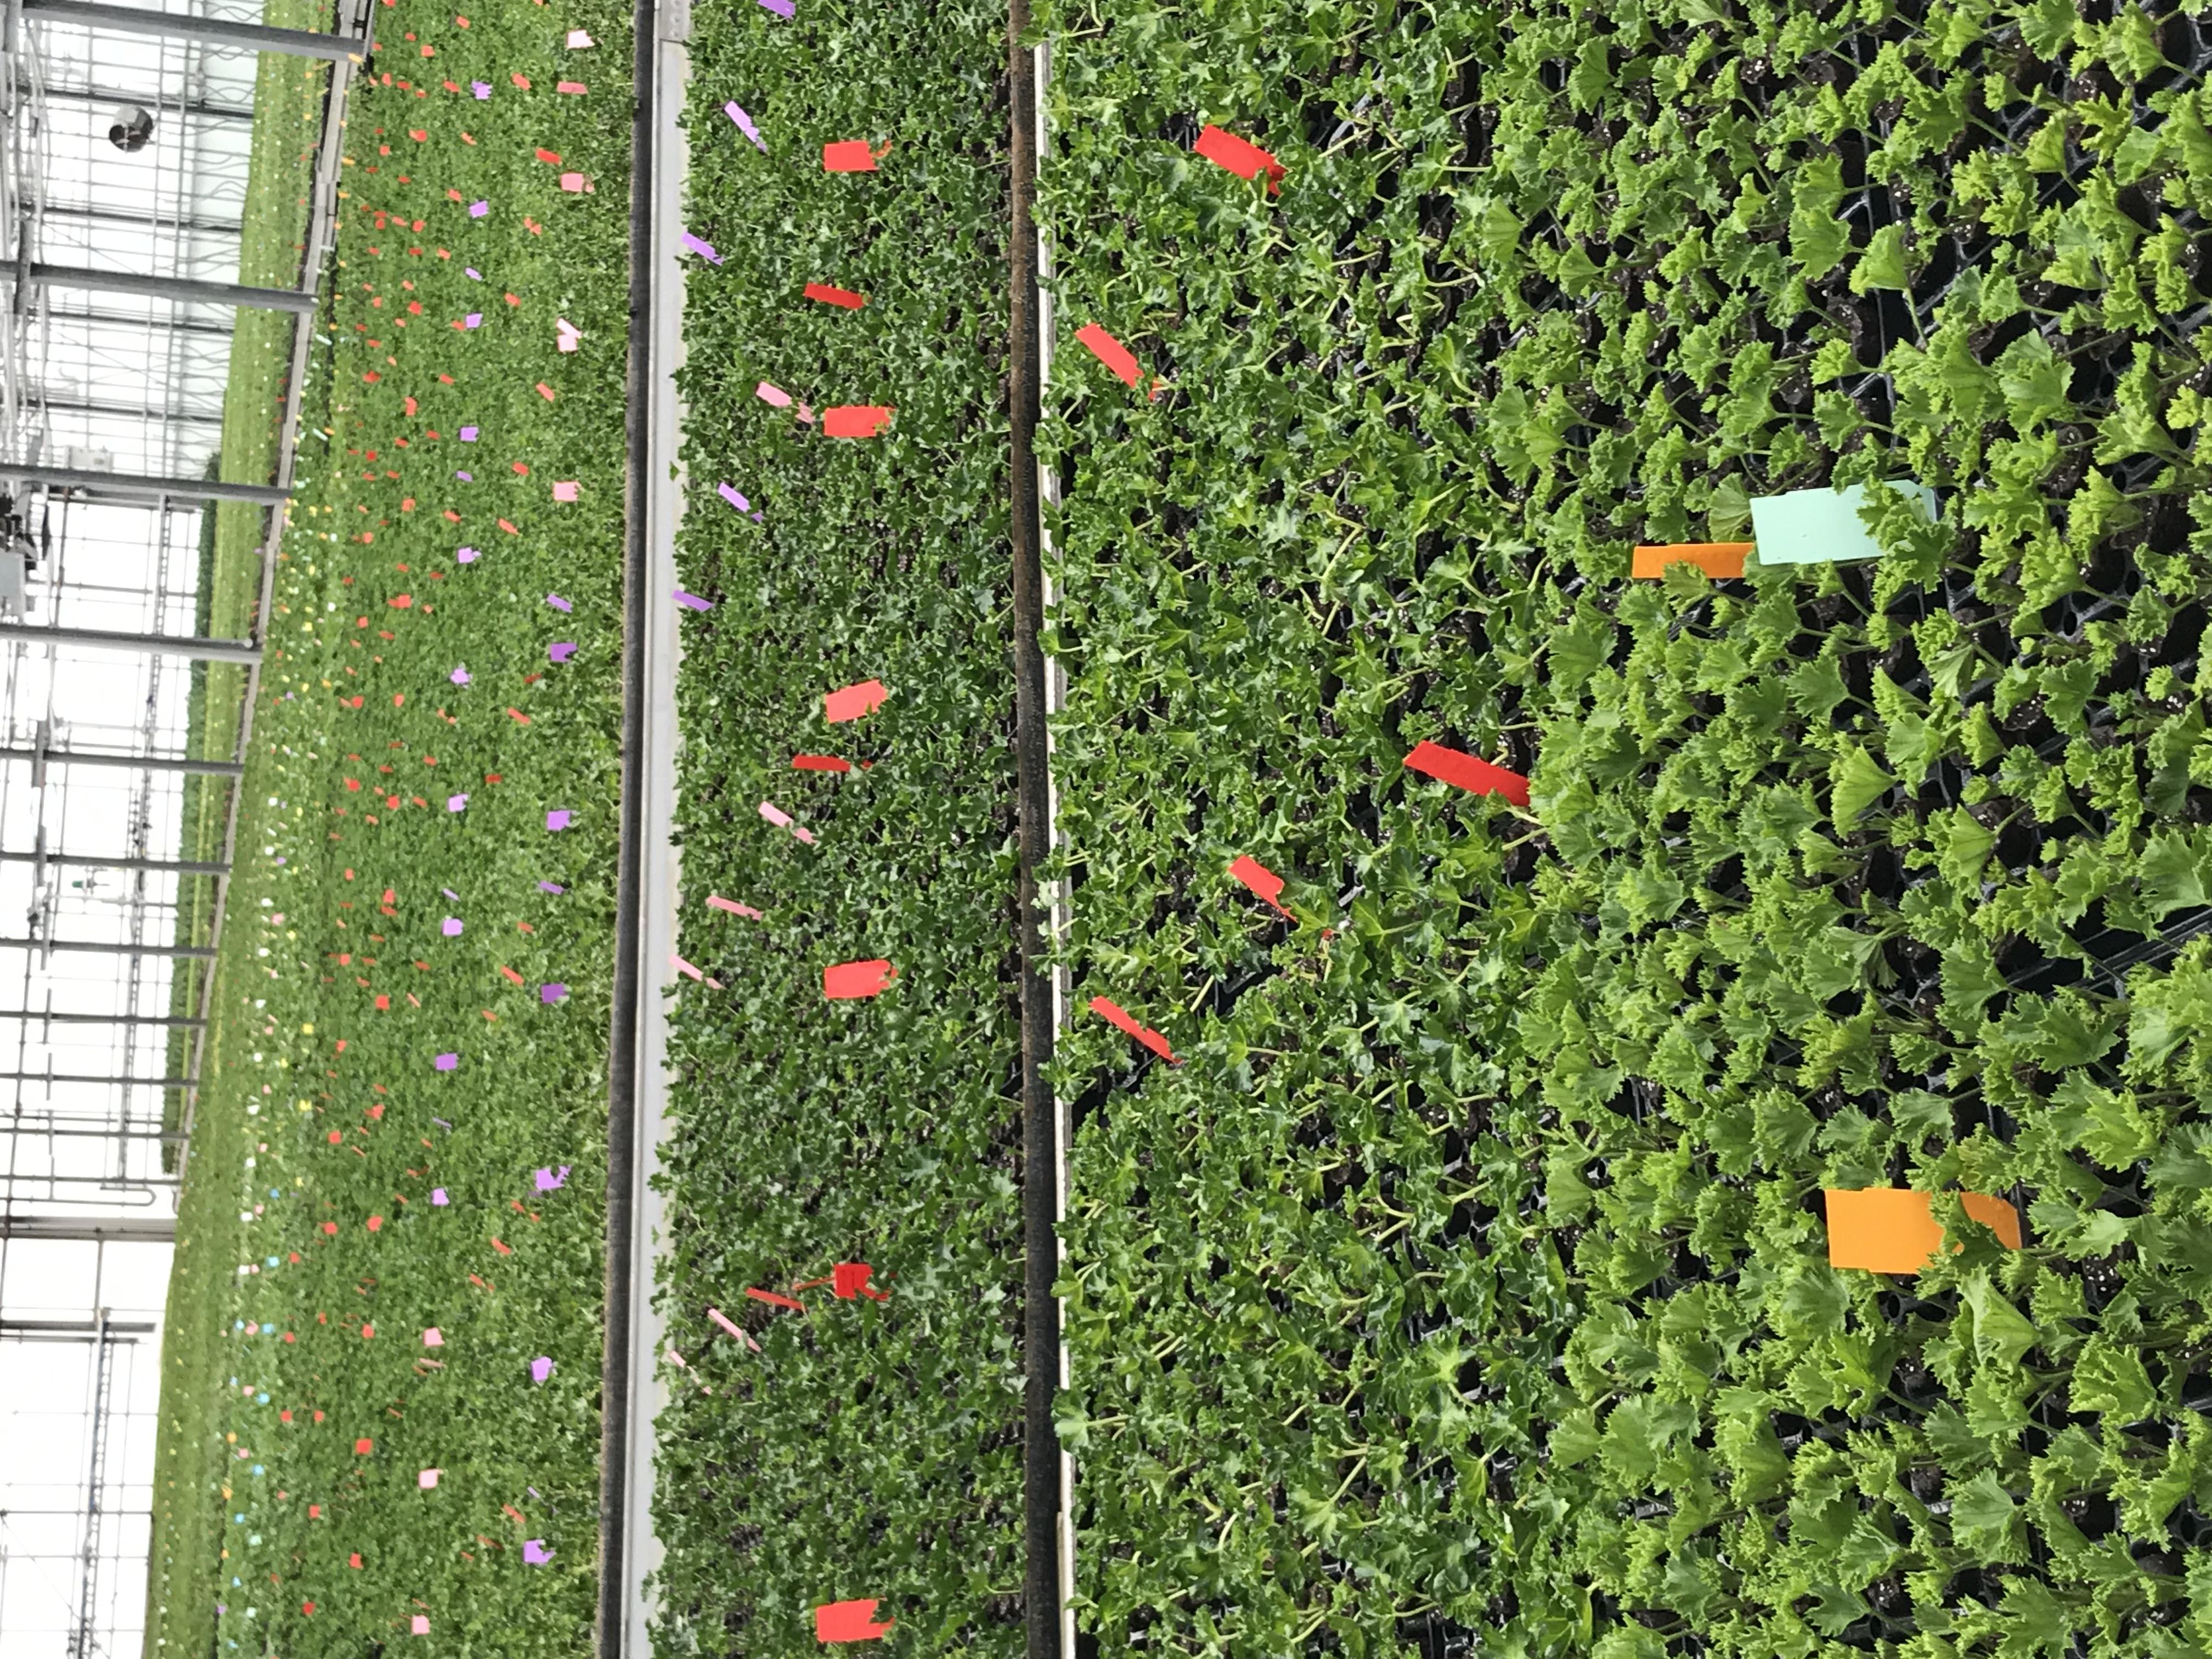 plants de fleurs EYRAUD PRODUCTIONS accompagnement Expertise RH